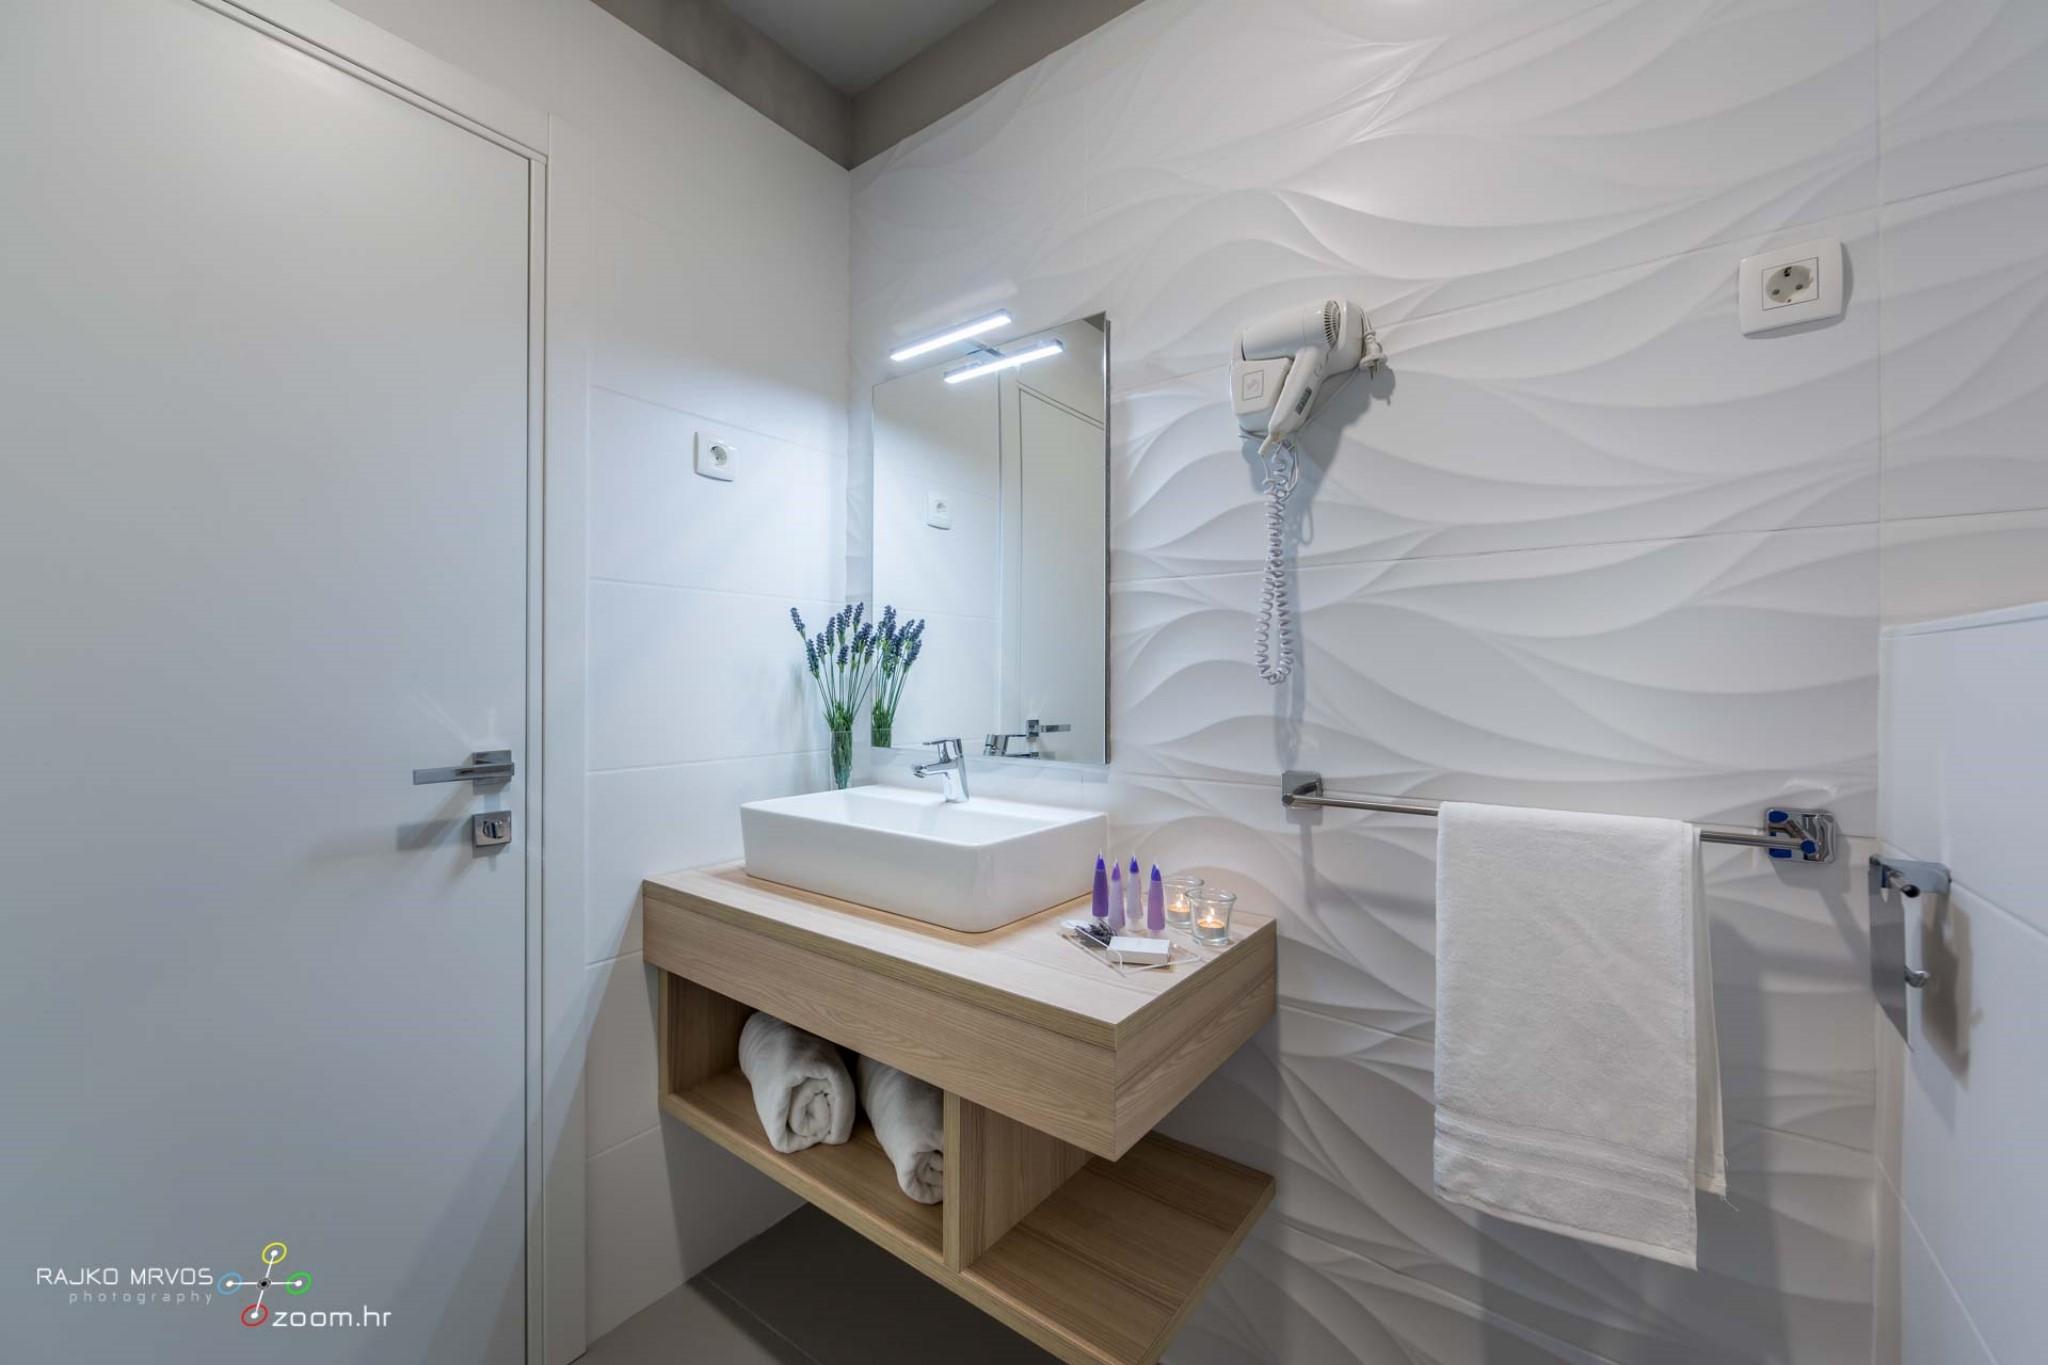 fotografiranje-interijera-fotograf-eksterijera-apartmana-vila-kuca-apartmani-Preelook-76